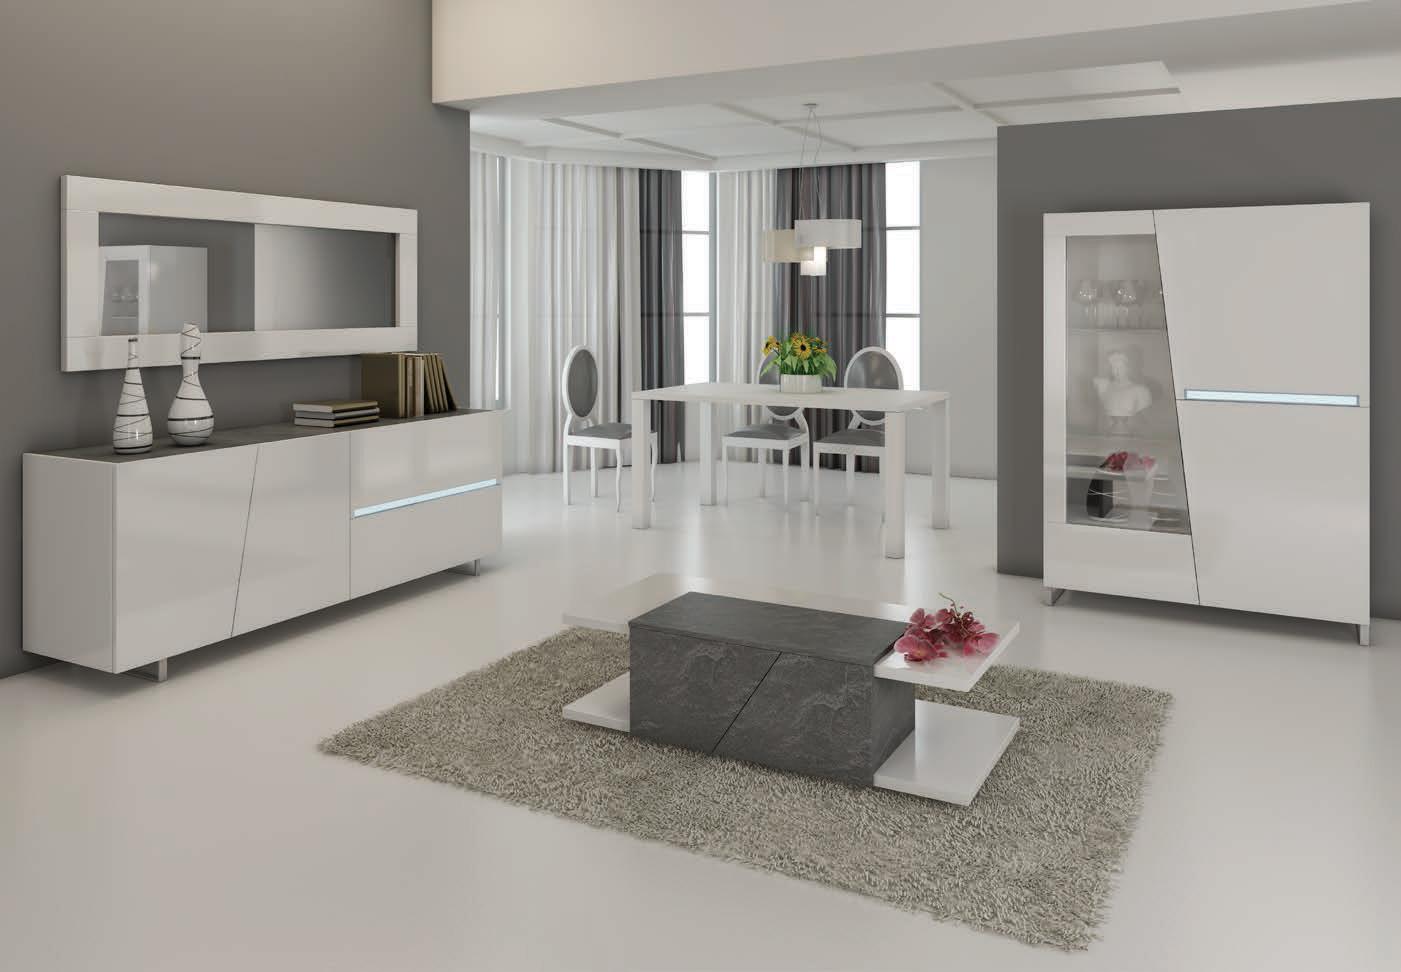 Stunning Mobili Sala Da Pranzo Moderni Photos - Design Trends 2017 ...